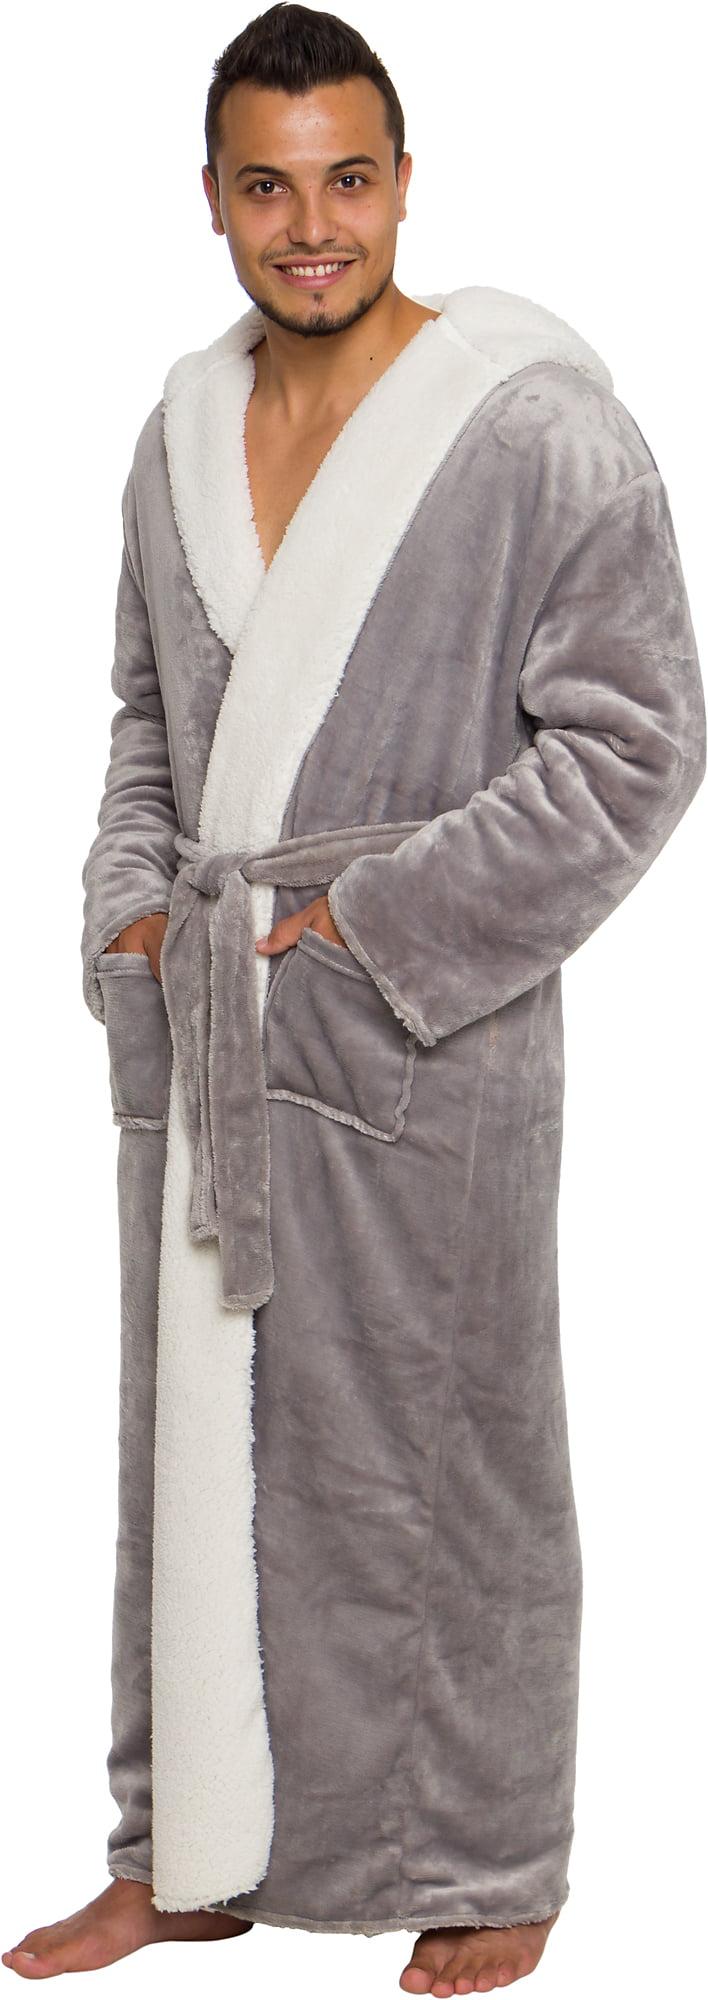 Full Length Luxury Plush Big Tall Robe Ross Michaels Mens Sherpa Lined Hooded Long Bathrobe Robes